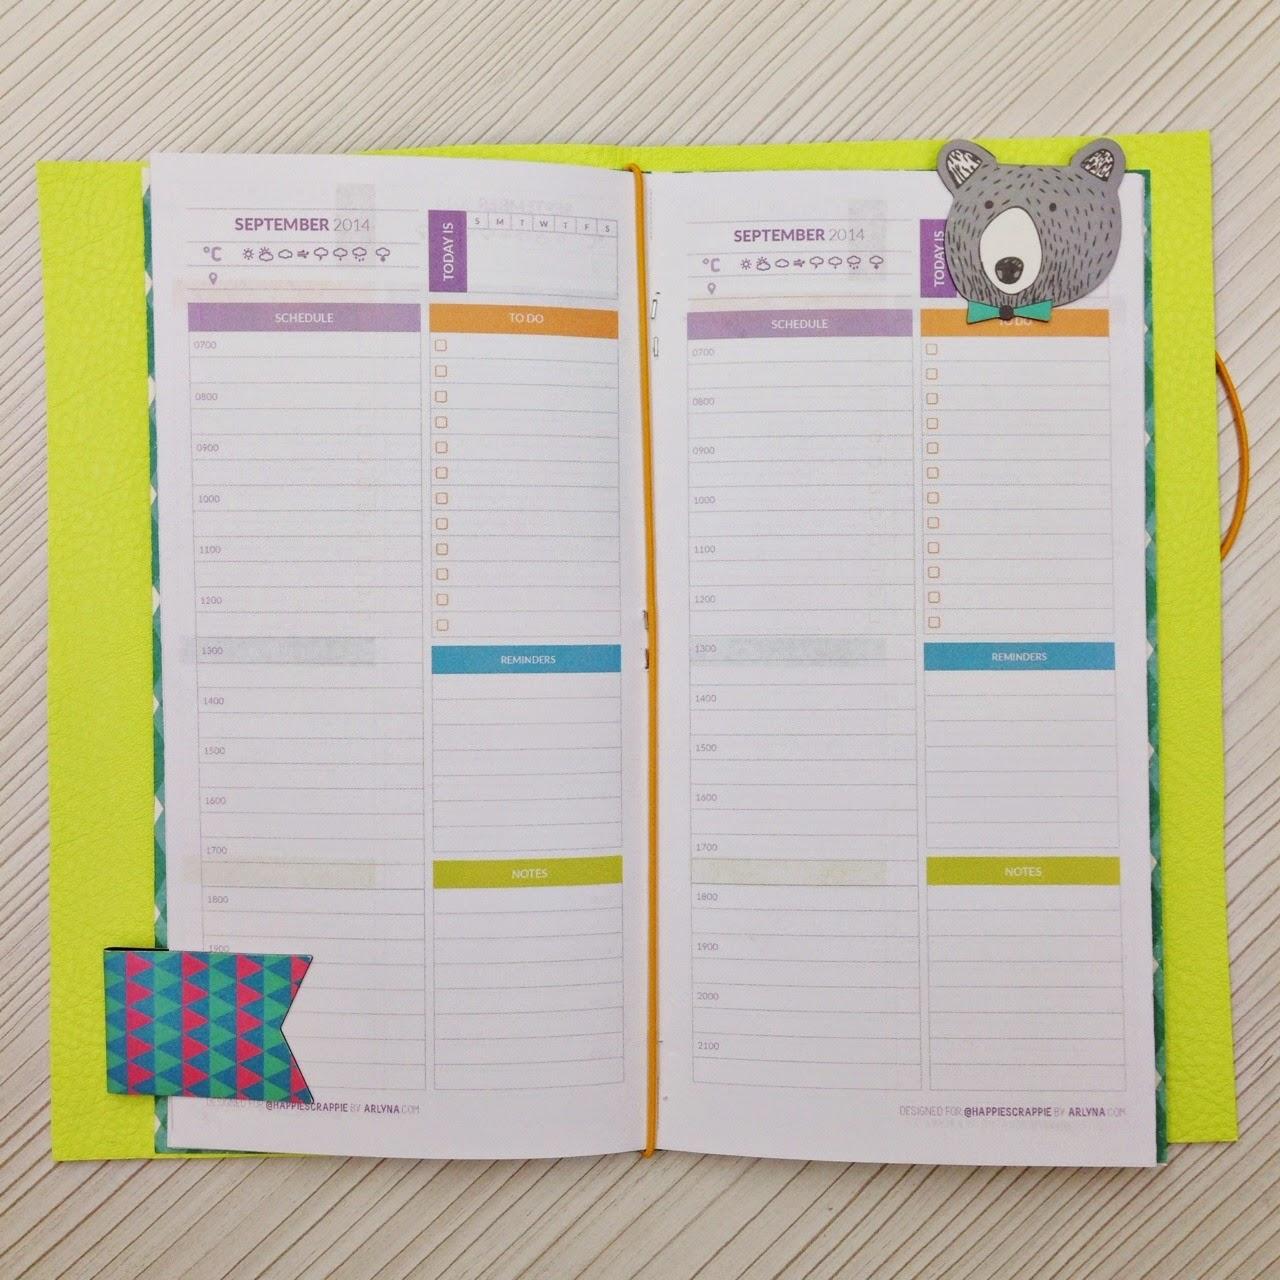 graphic regarding Free Printable Traveler's Notebook Inserts called Pleasure is Spy: Freebies⎪Happiedori No cost Printables